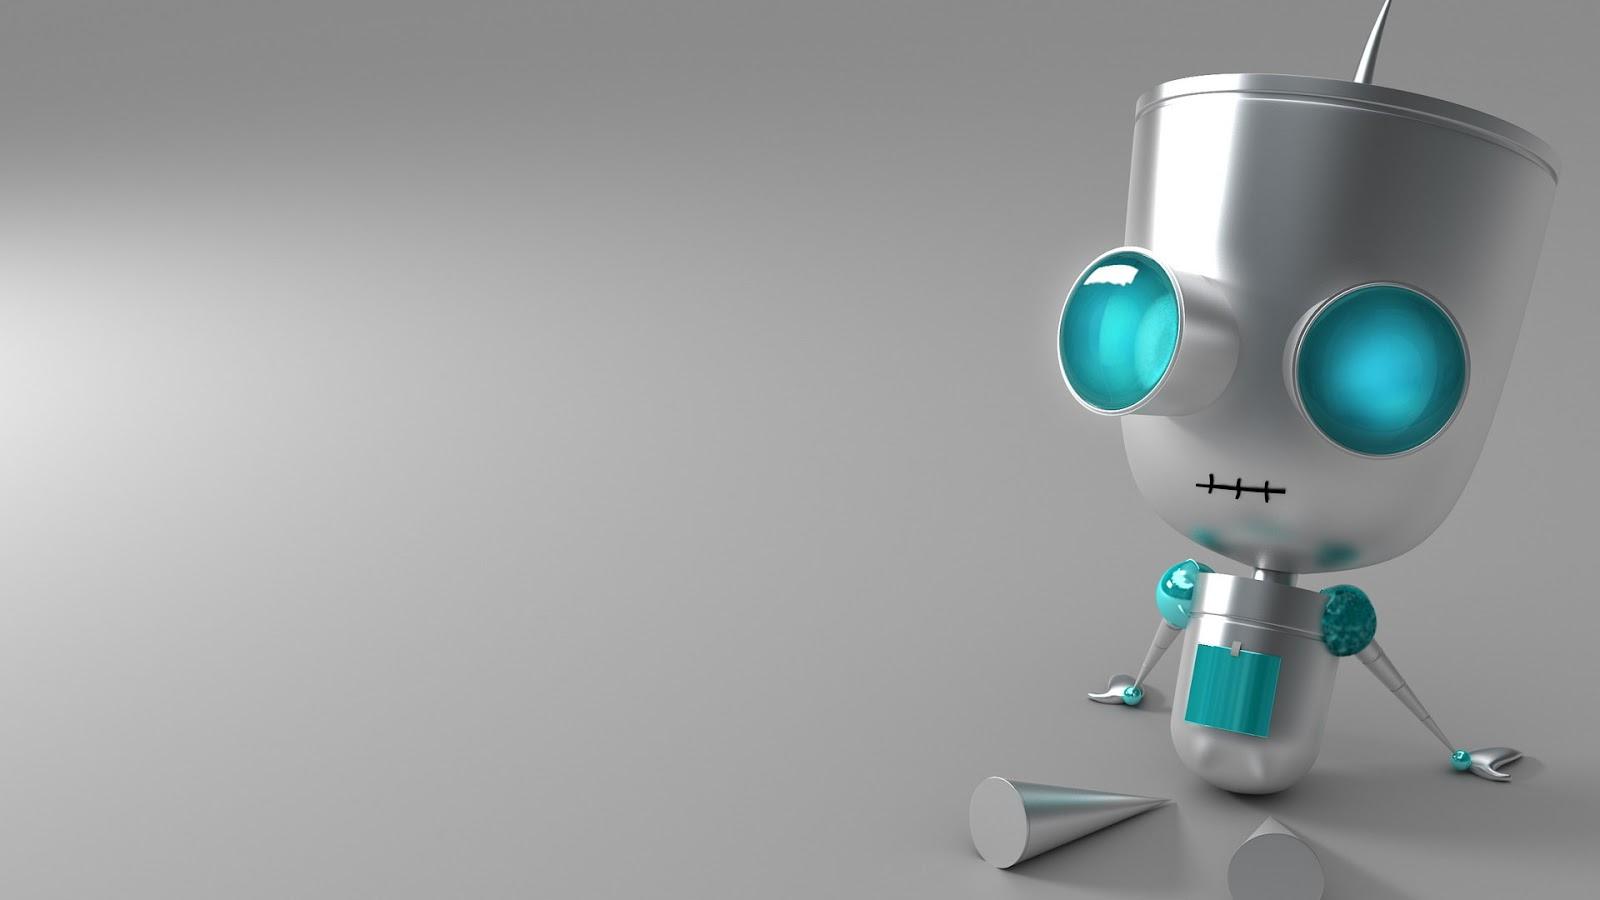 Kinds Of Wallpapers: Cute Robot Wallpaper